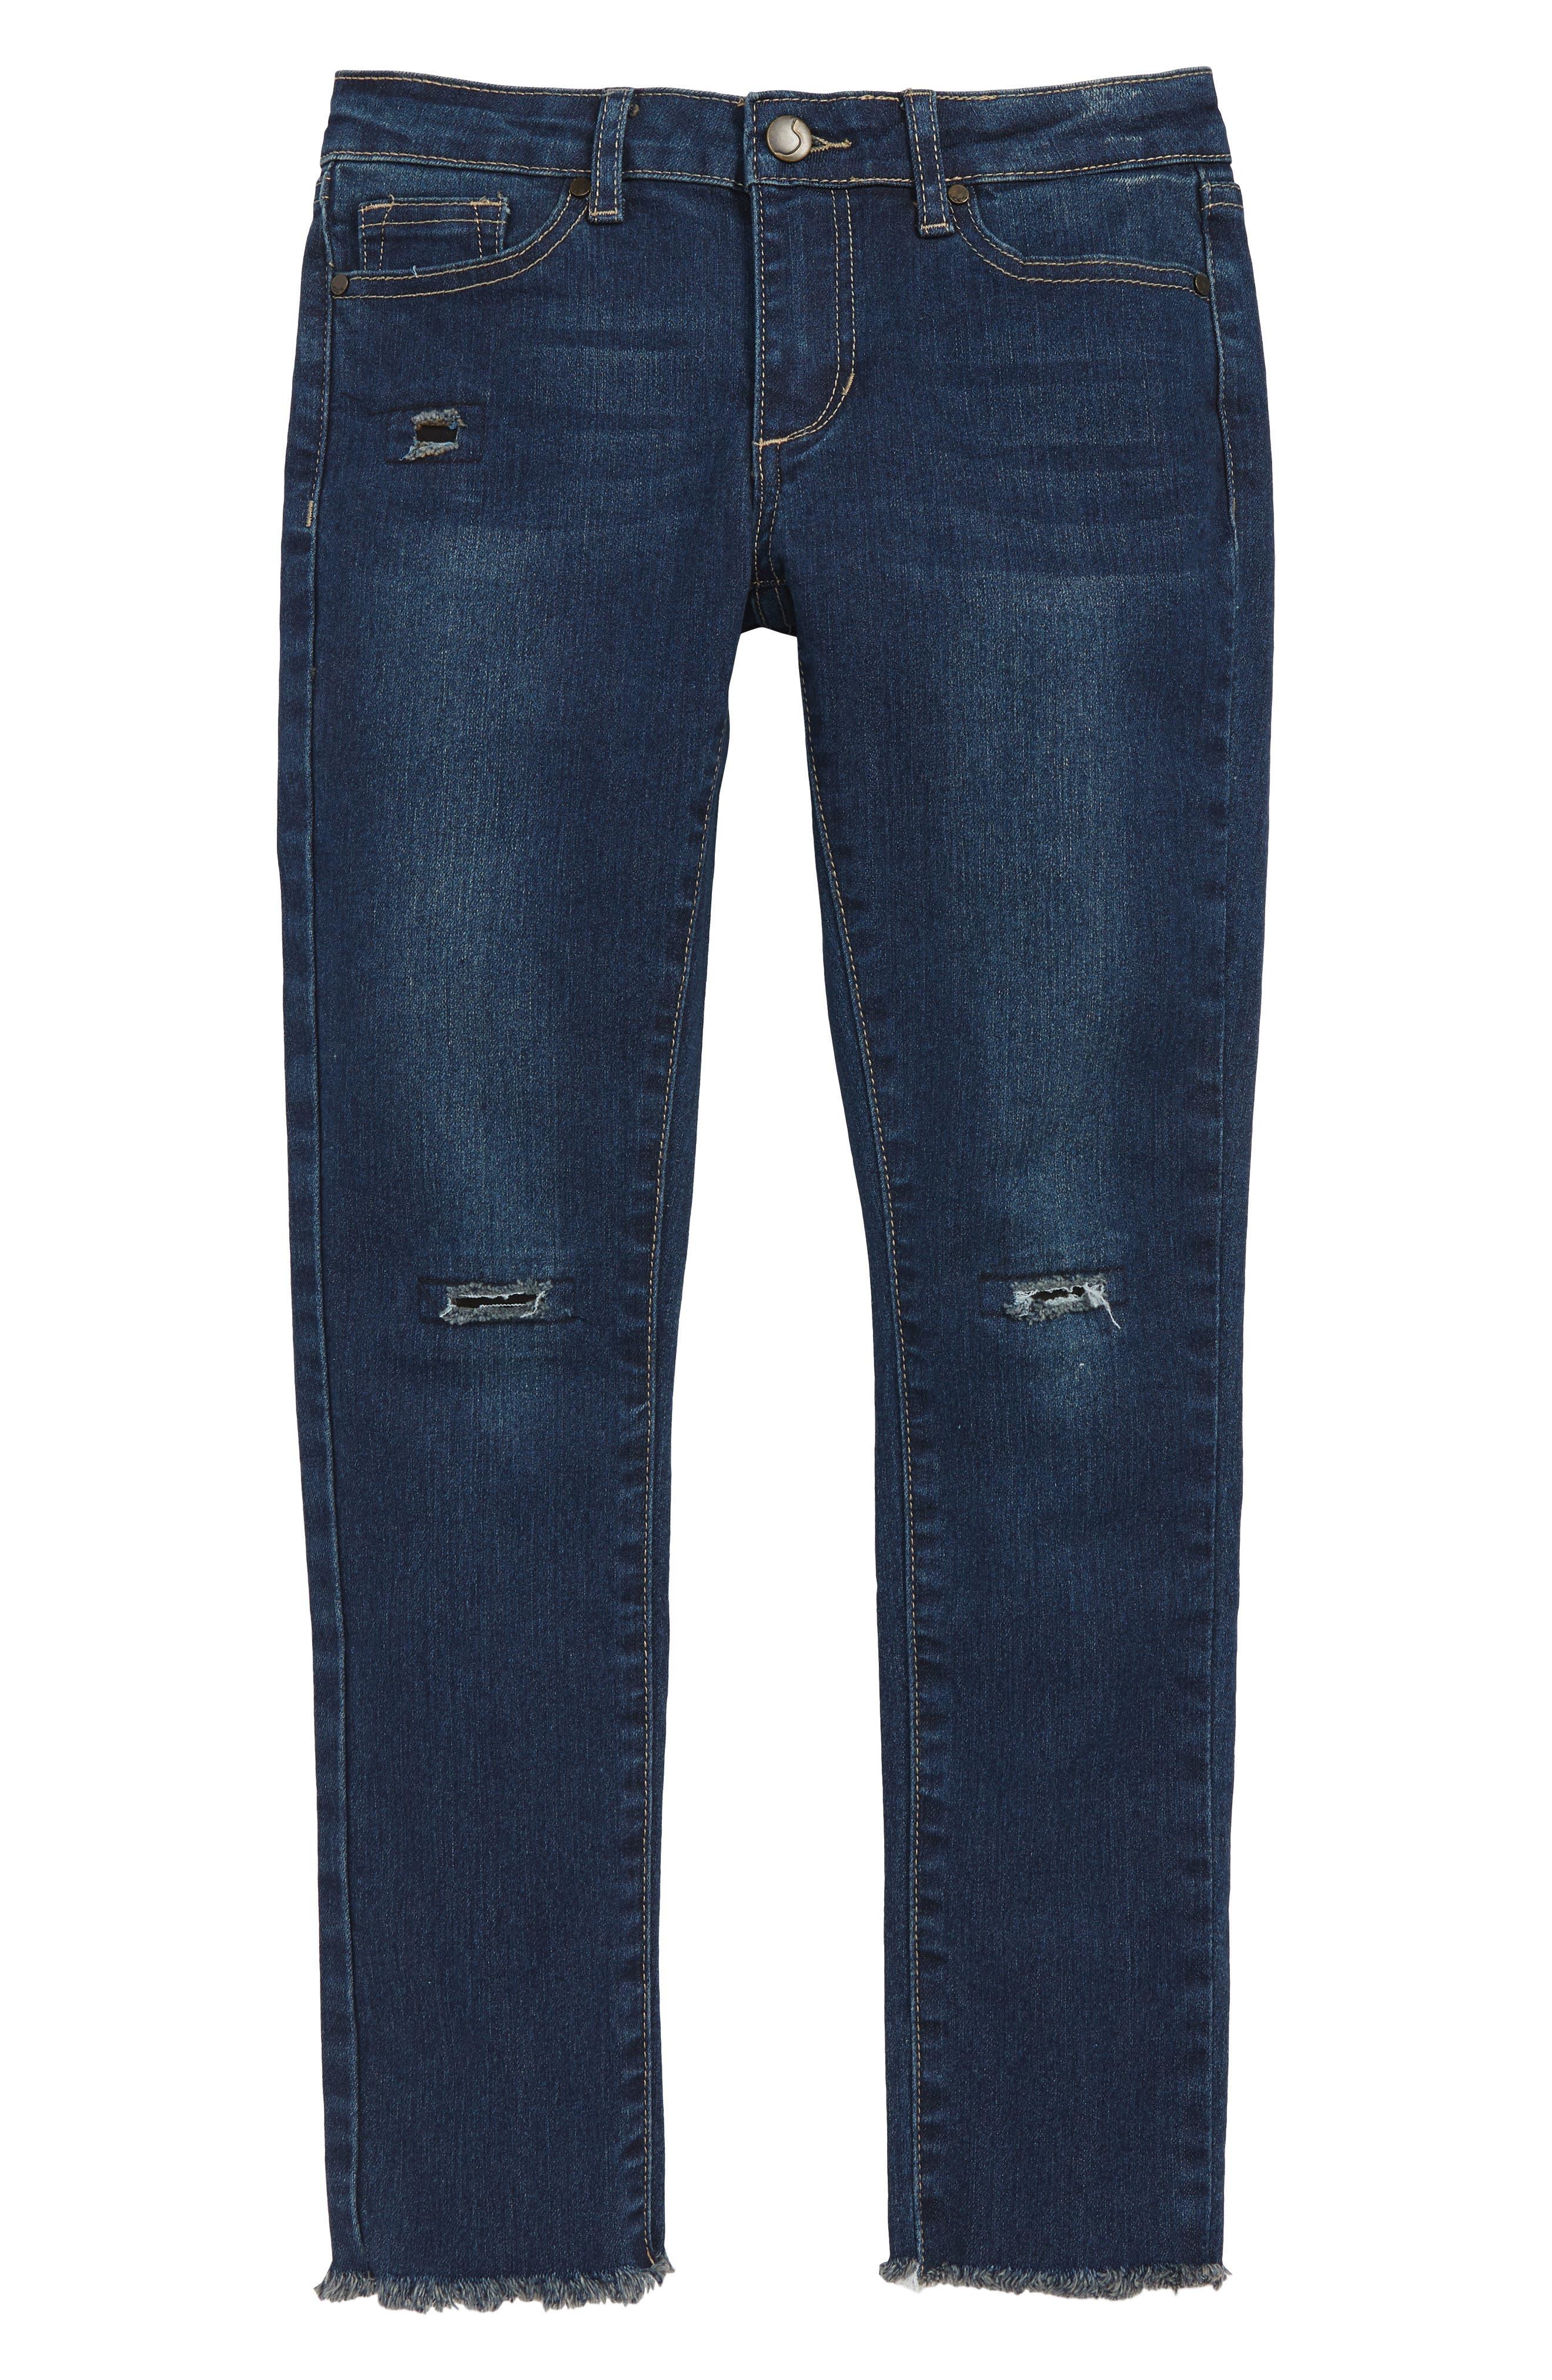 Girls JoeS The Markie Skinny Ankle Jeans